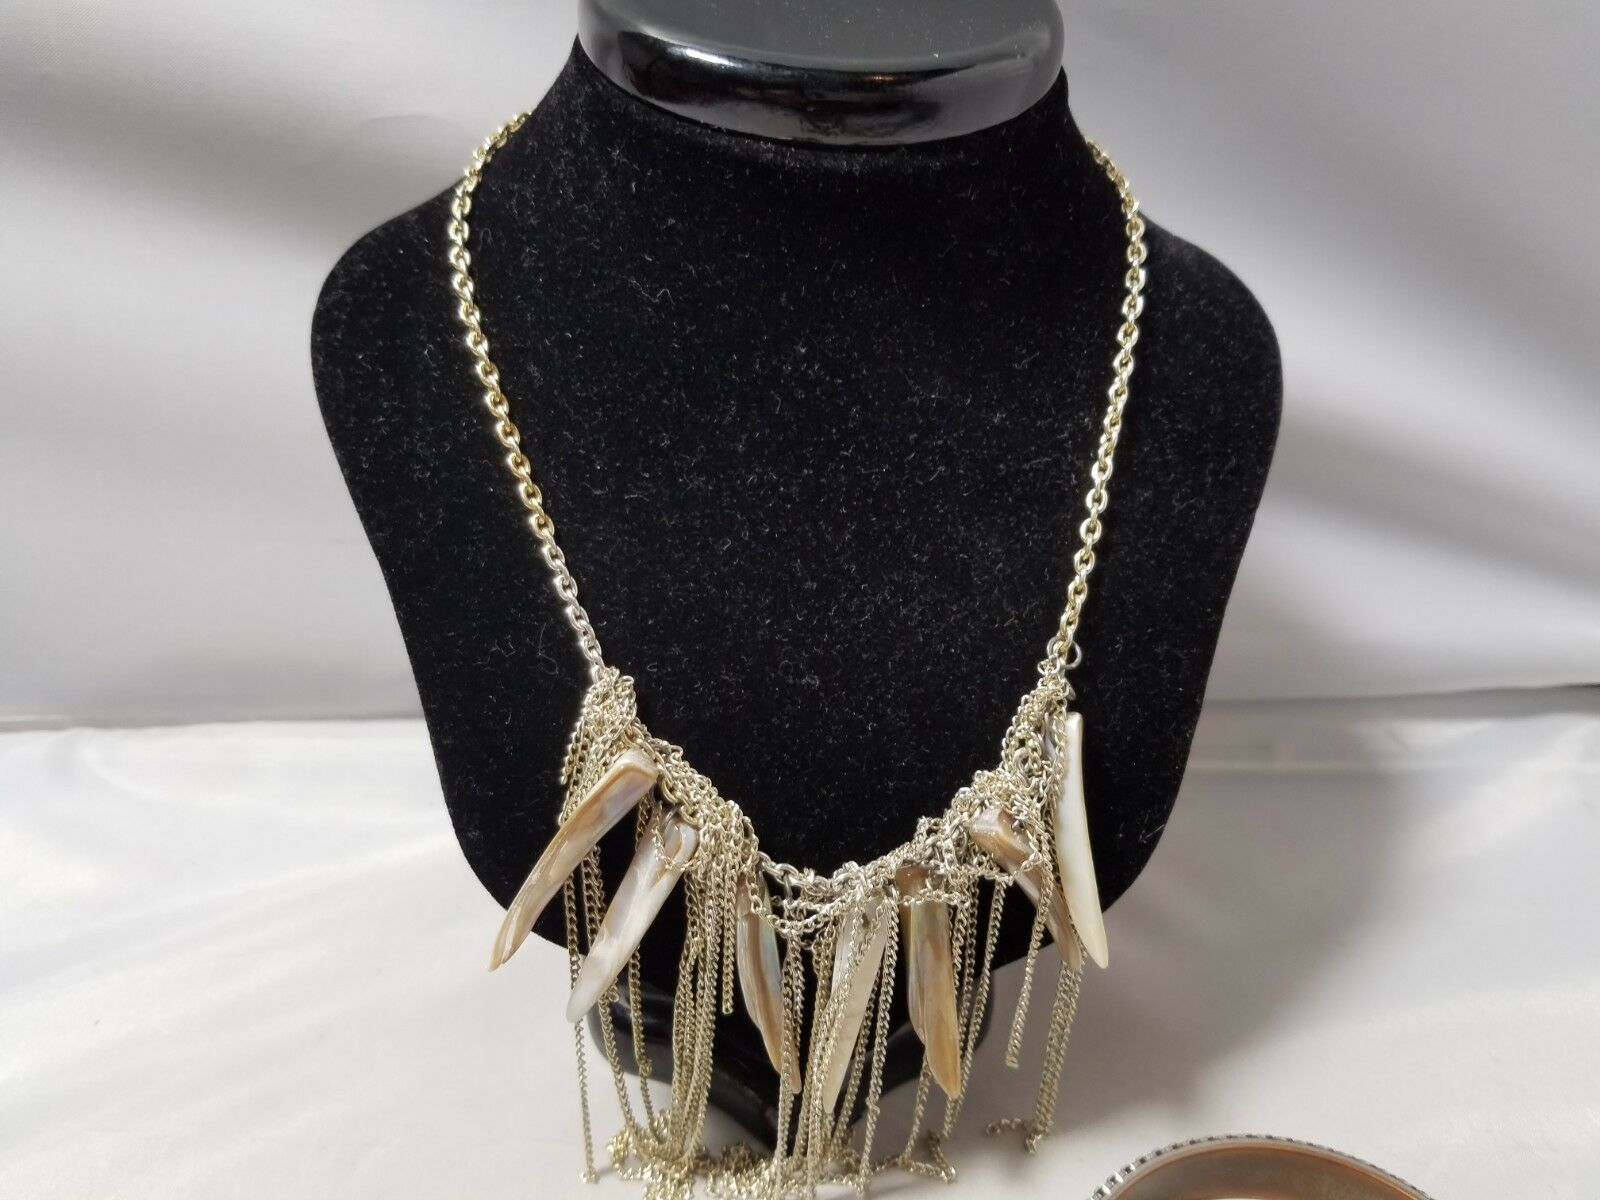 Vintage Retro Mod Fashion Jewelry Set Earrings Bangle Necklace Silver Tone